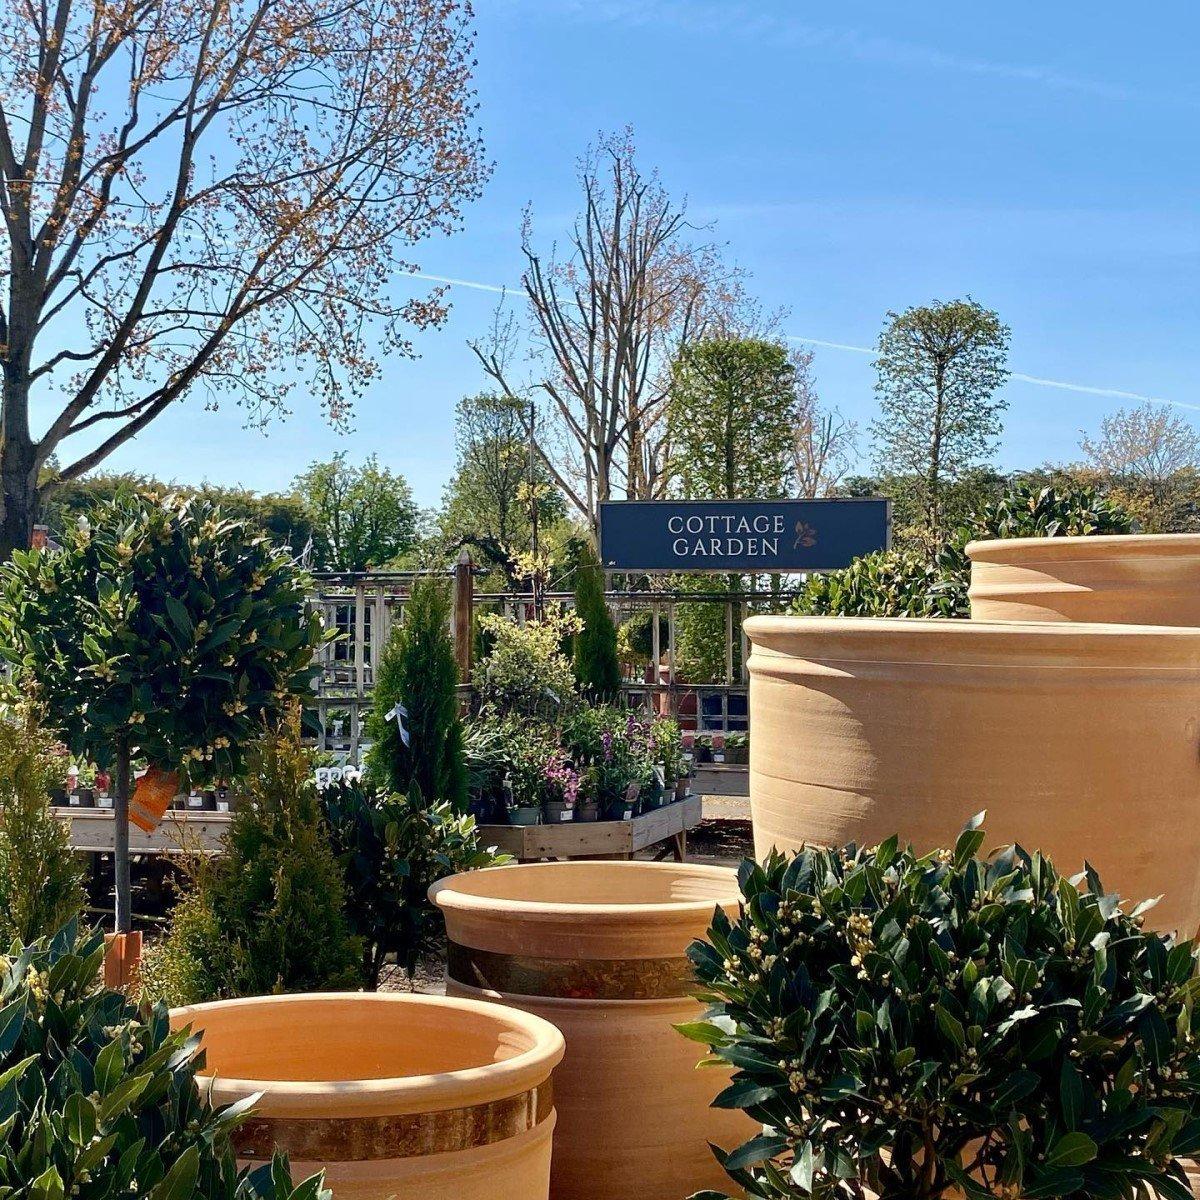 Garden centres to visit in Oxfordshire - Burford Garden Company